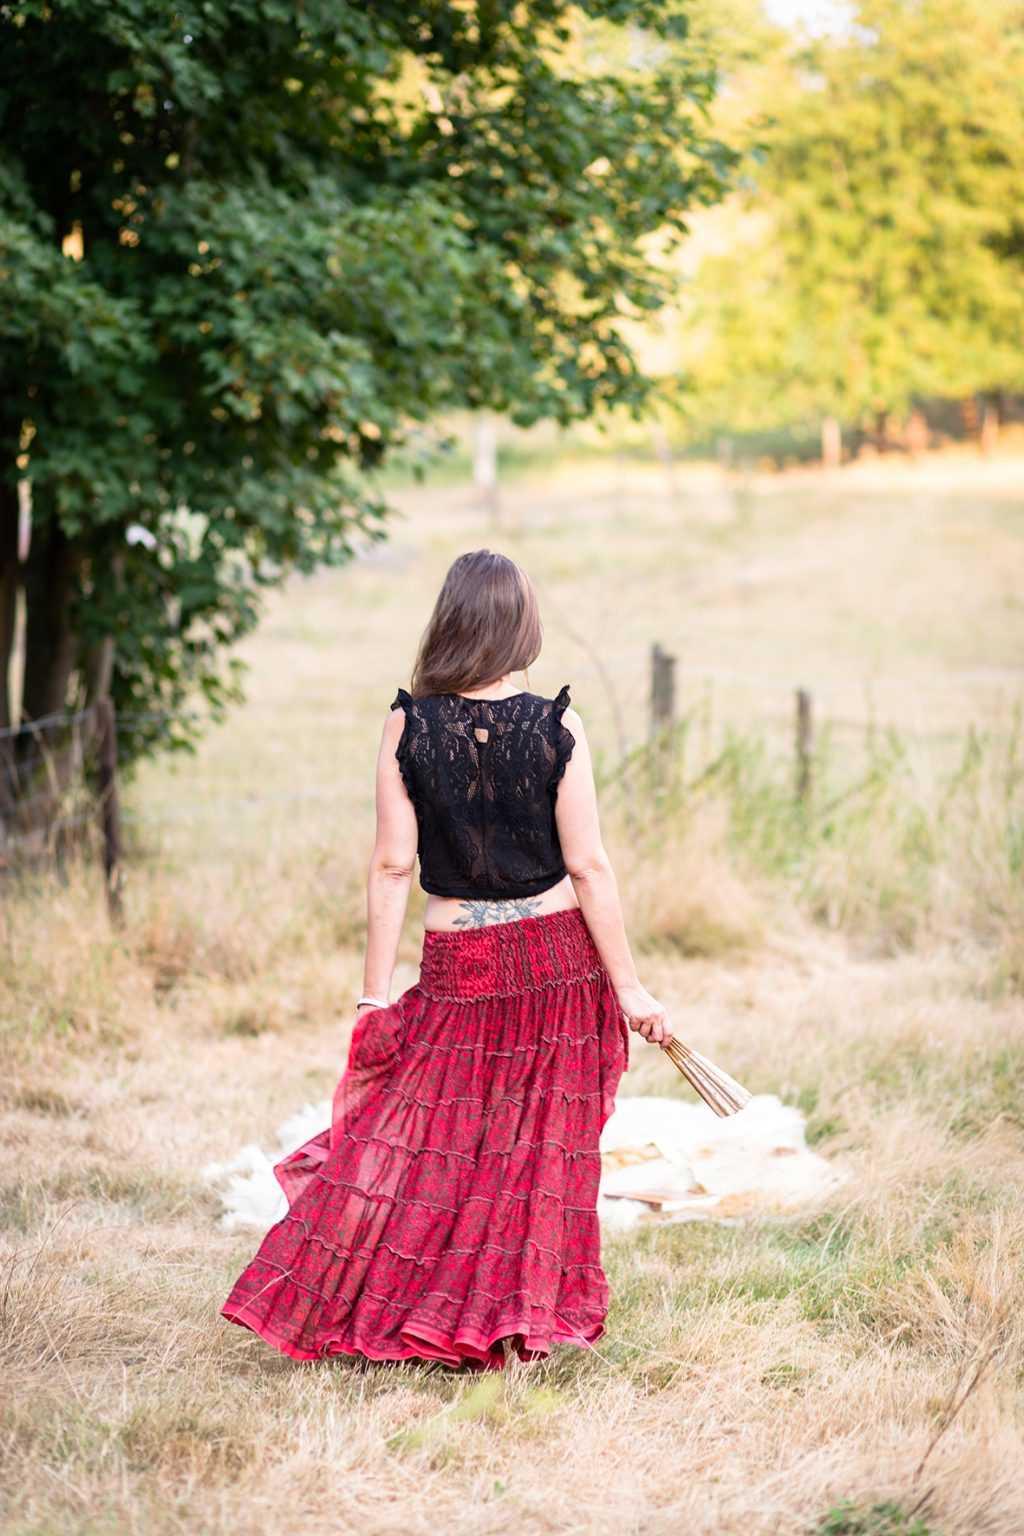 Prêtresse de l'Amour | Jessica Haraluna